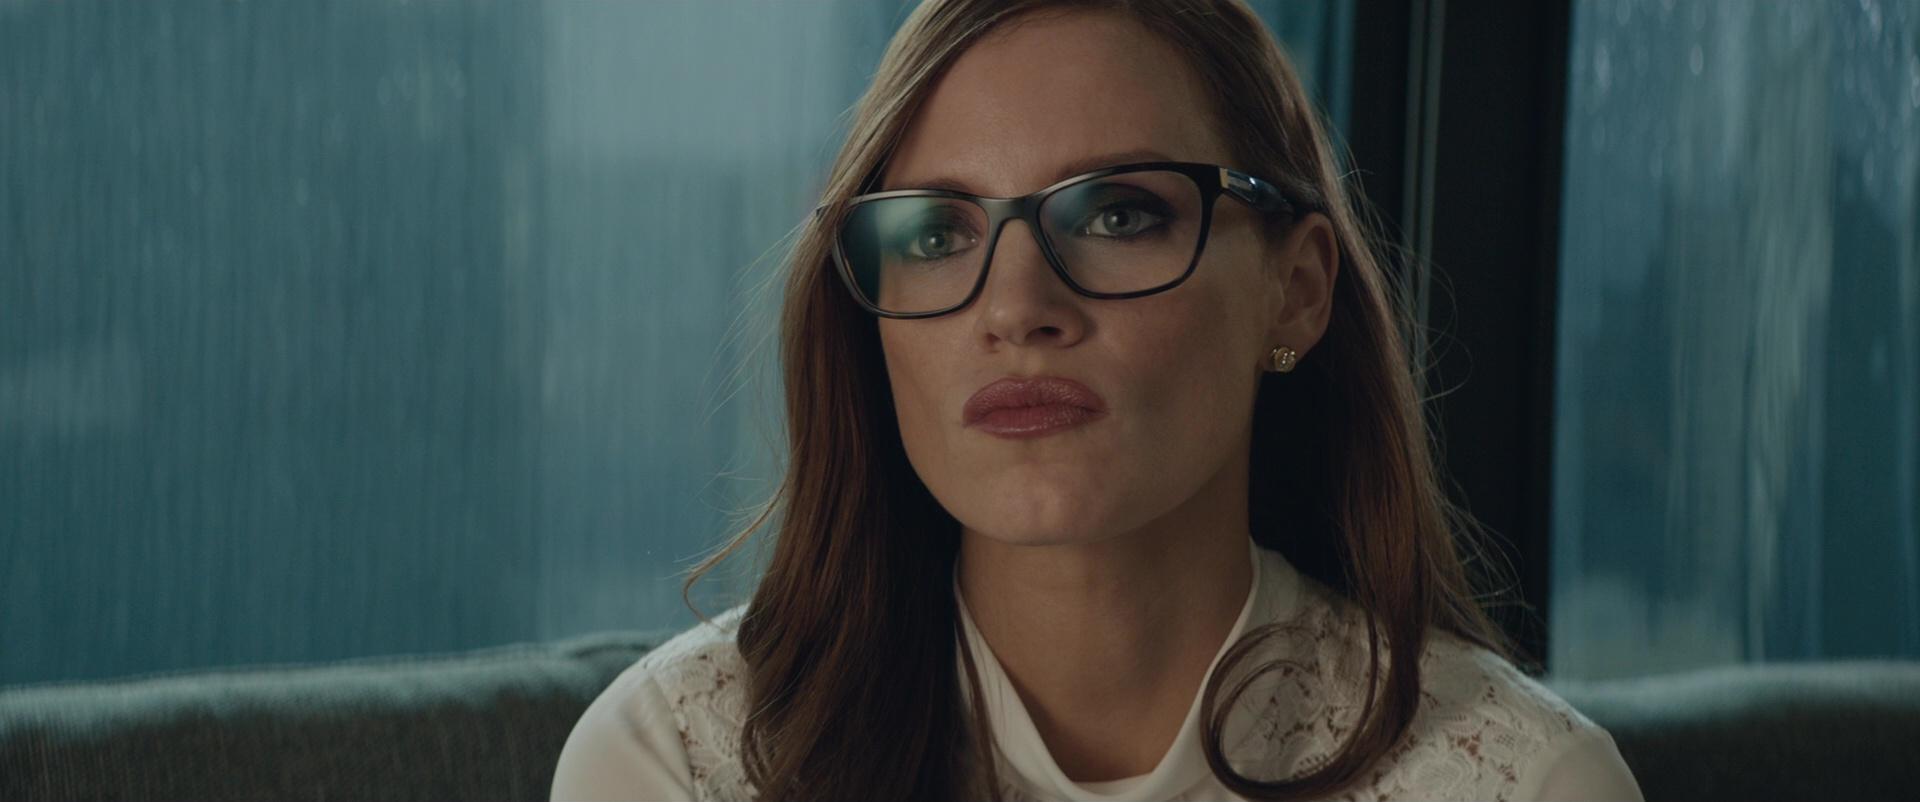 Black Toyota Tacoma >> Prada Square Plastic Eyeglasses Worn by Jessica Chastain ...